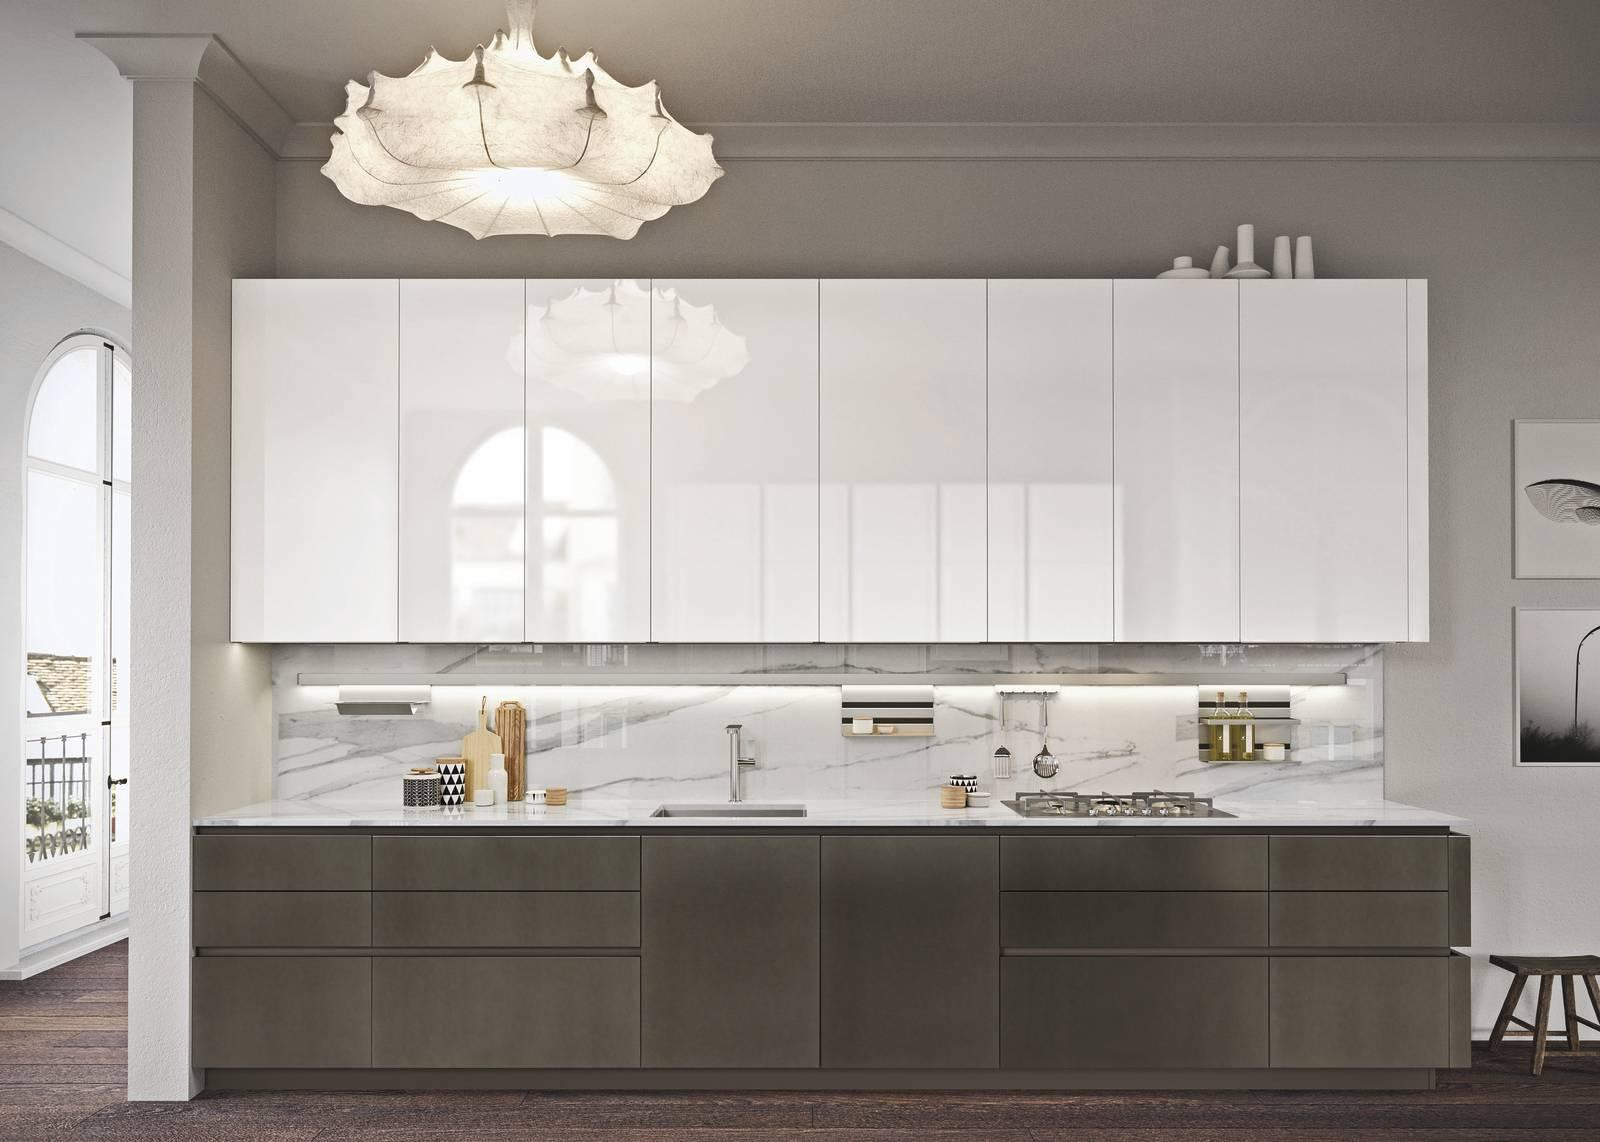 Altezza Cucina Ikea pensili in cucina: una comodità cui è difficile rinunciare